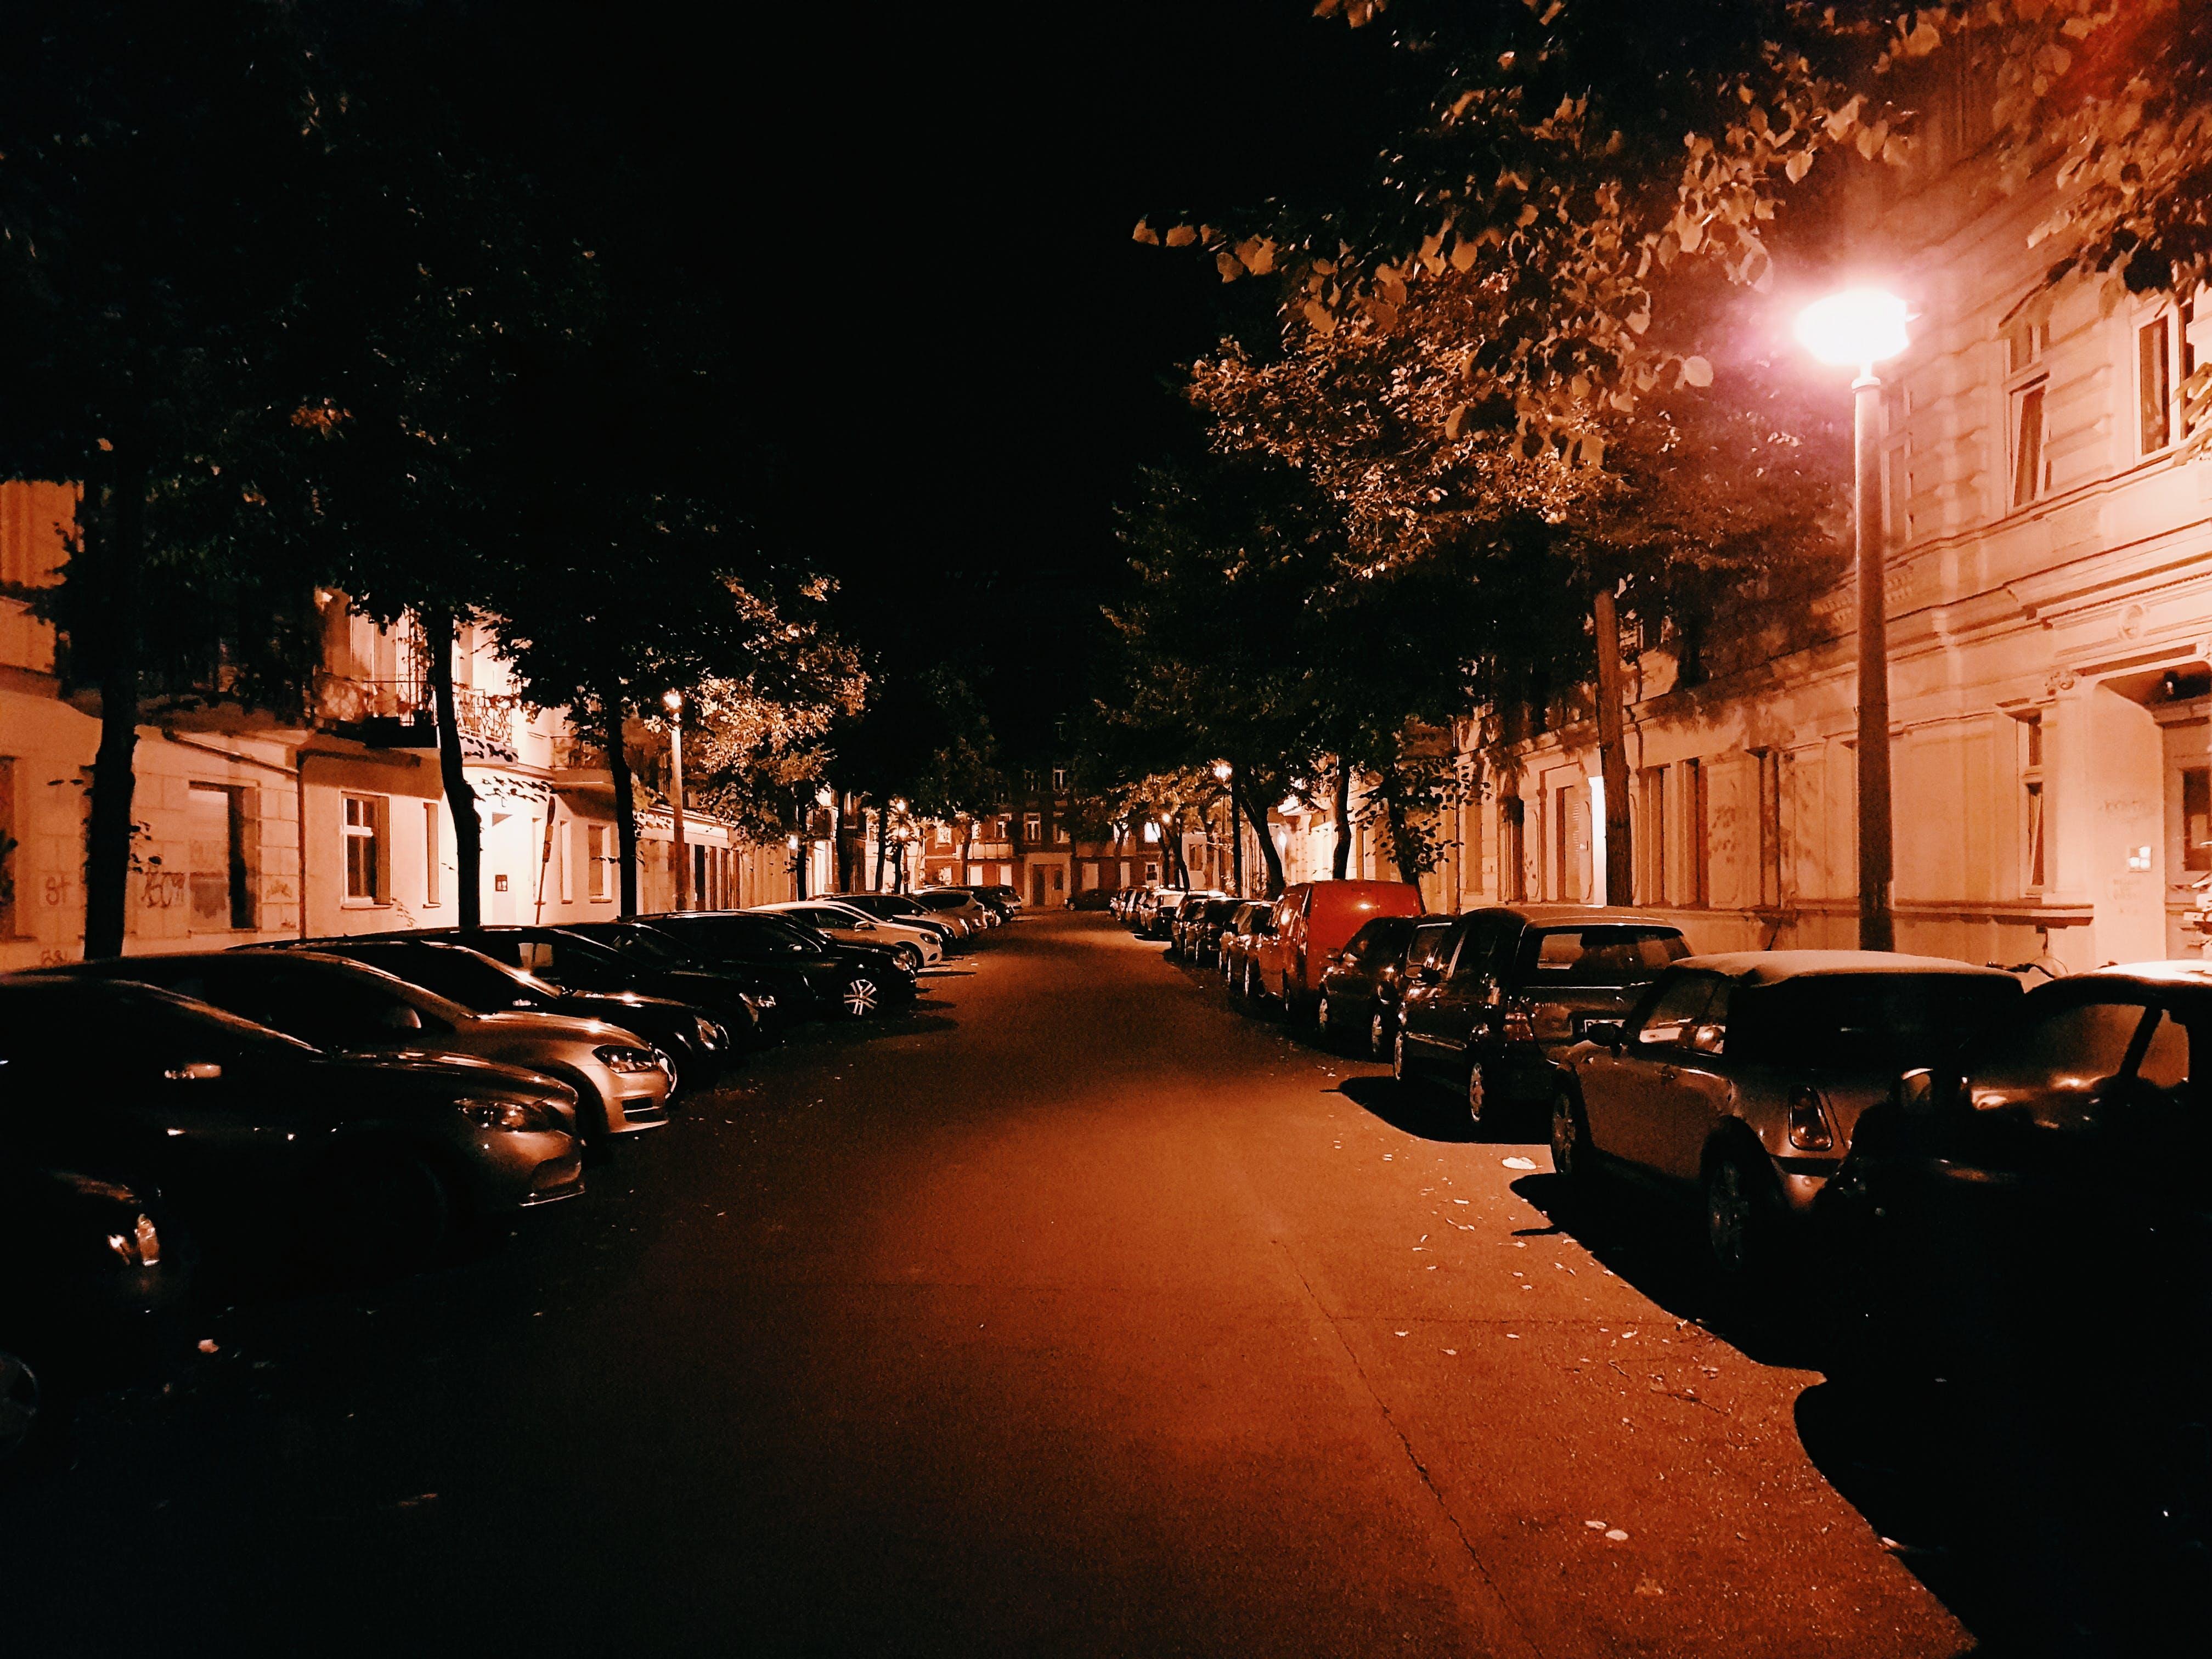 Gratis stockfoto met architectuur, auto, auto's, avond